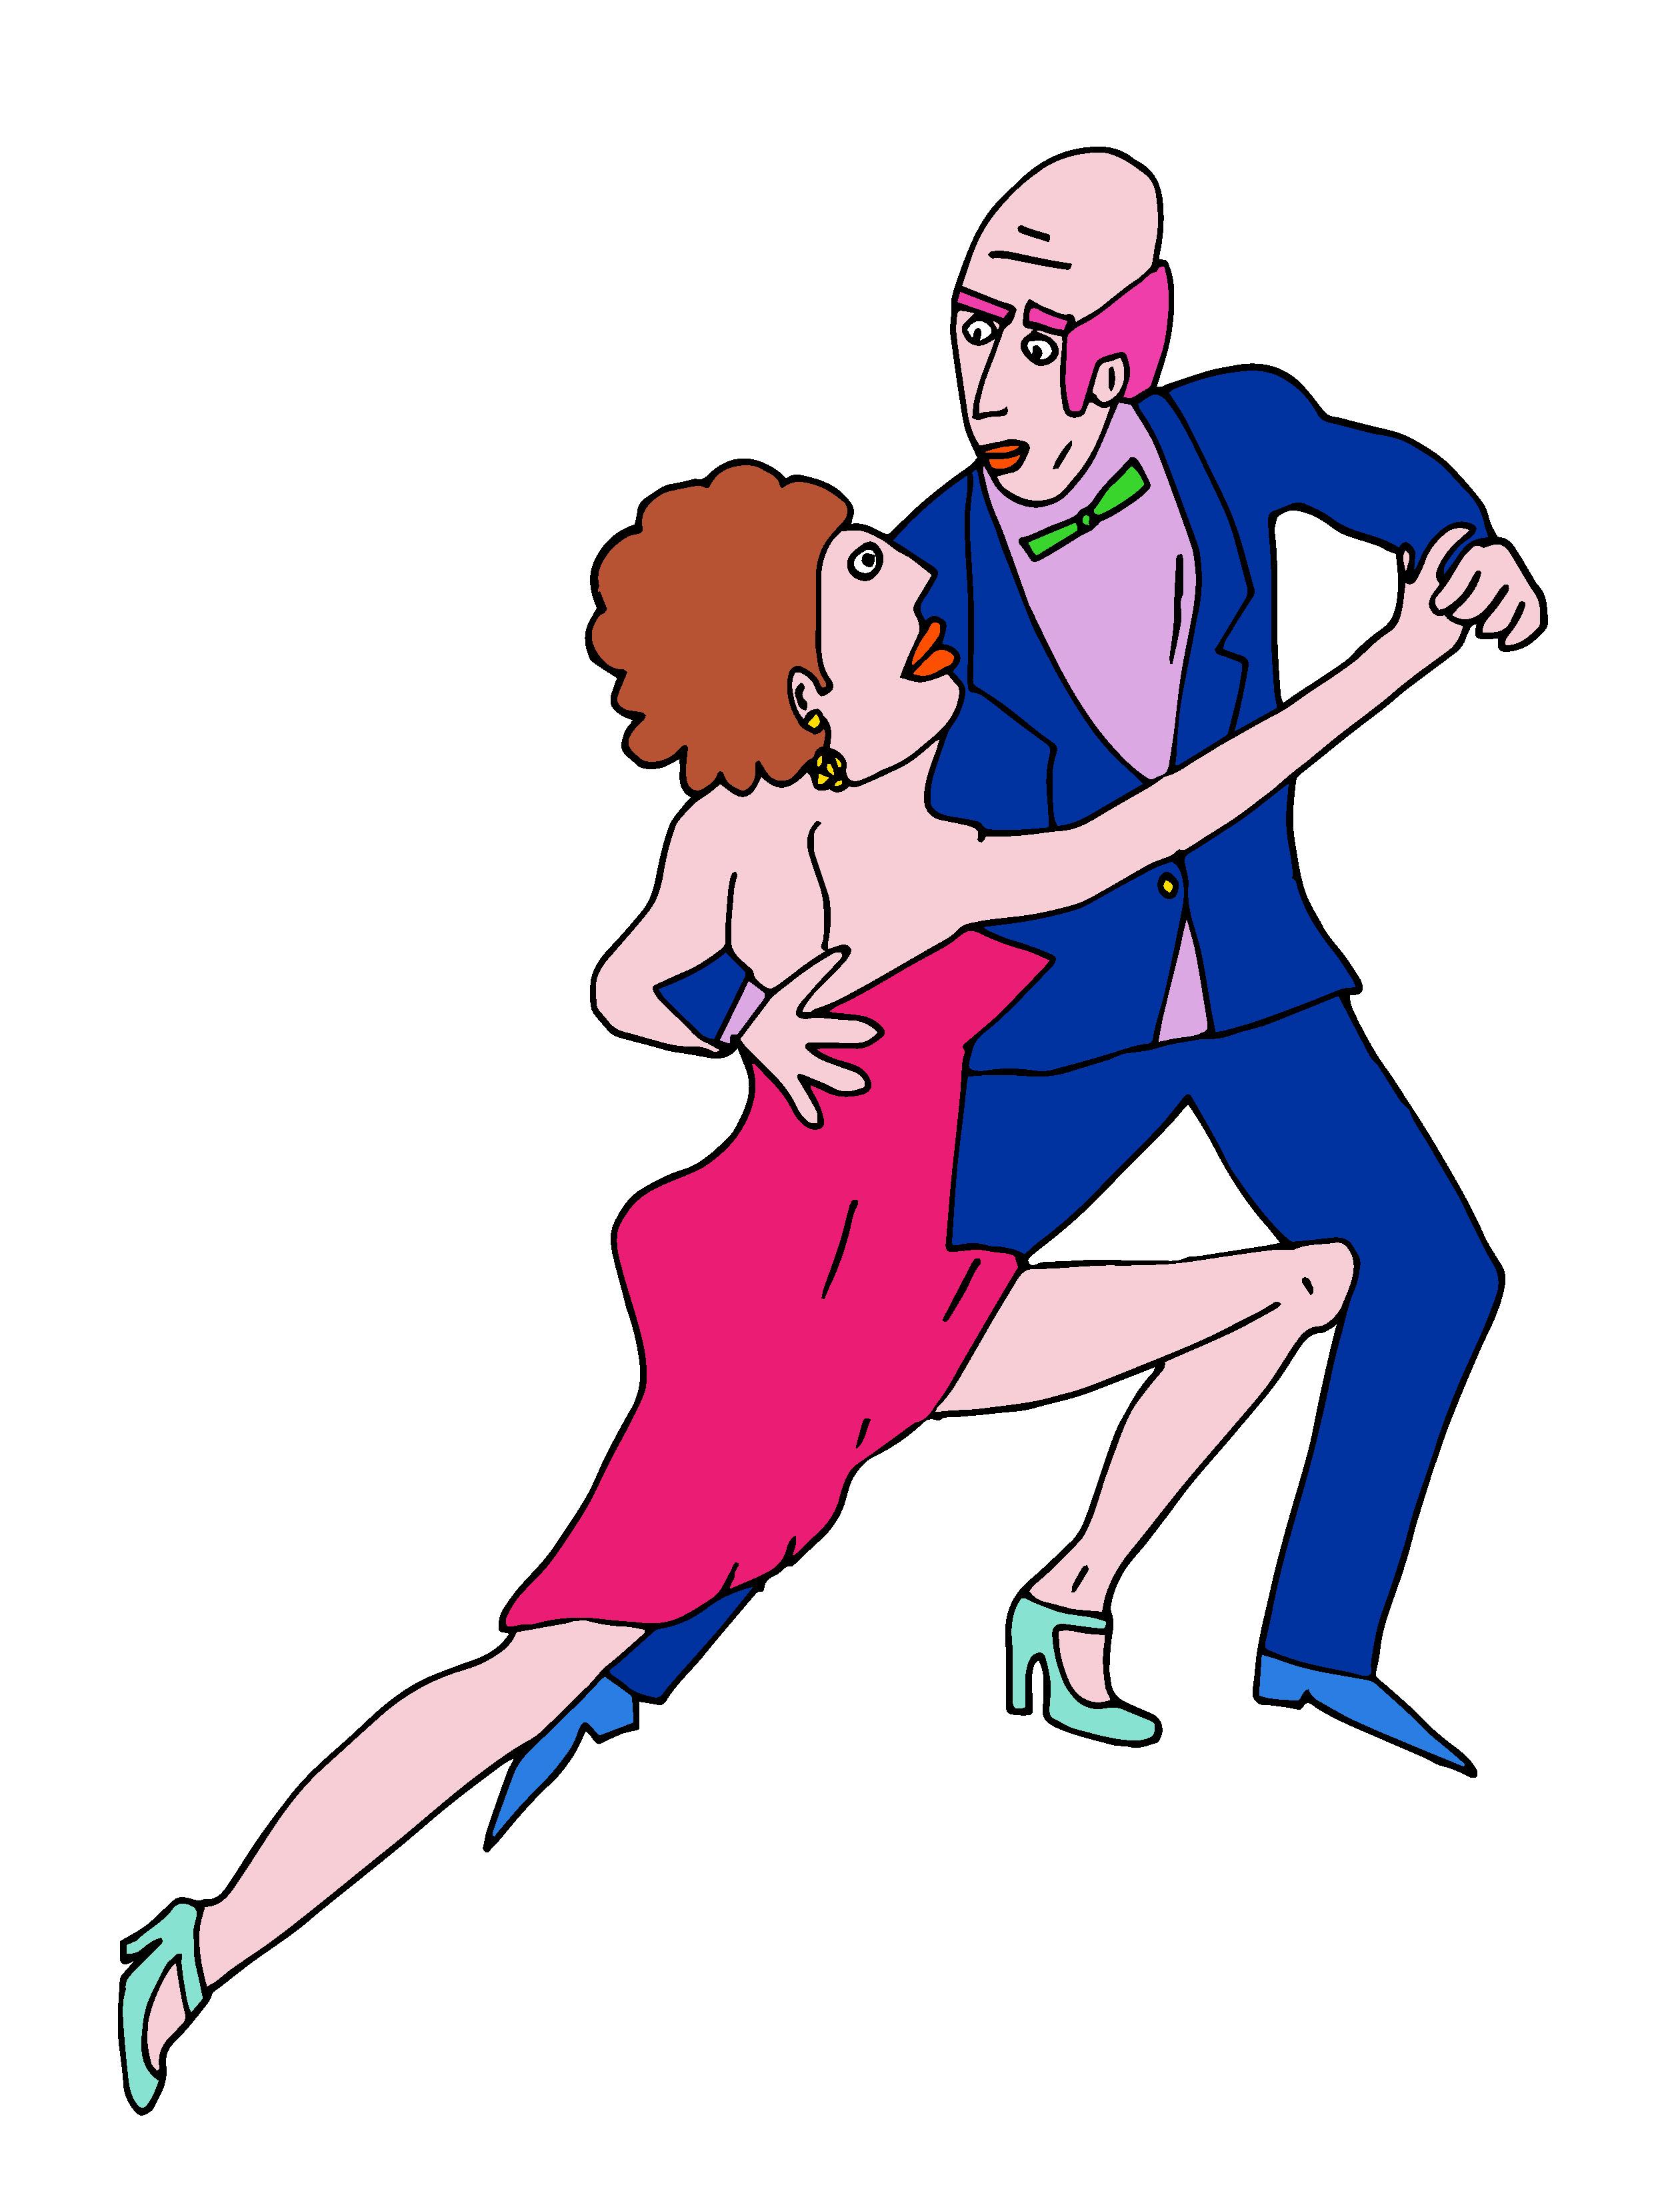 The Dance / 2013